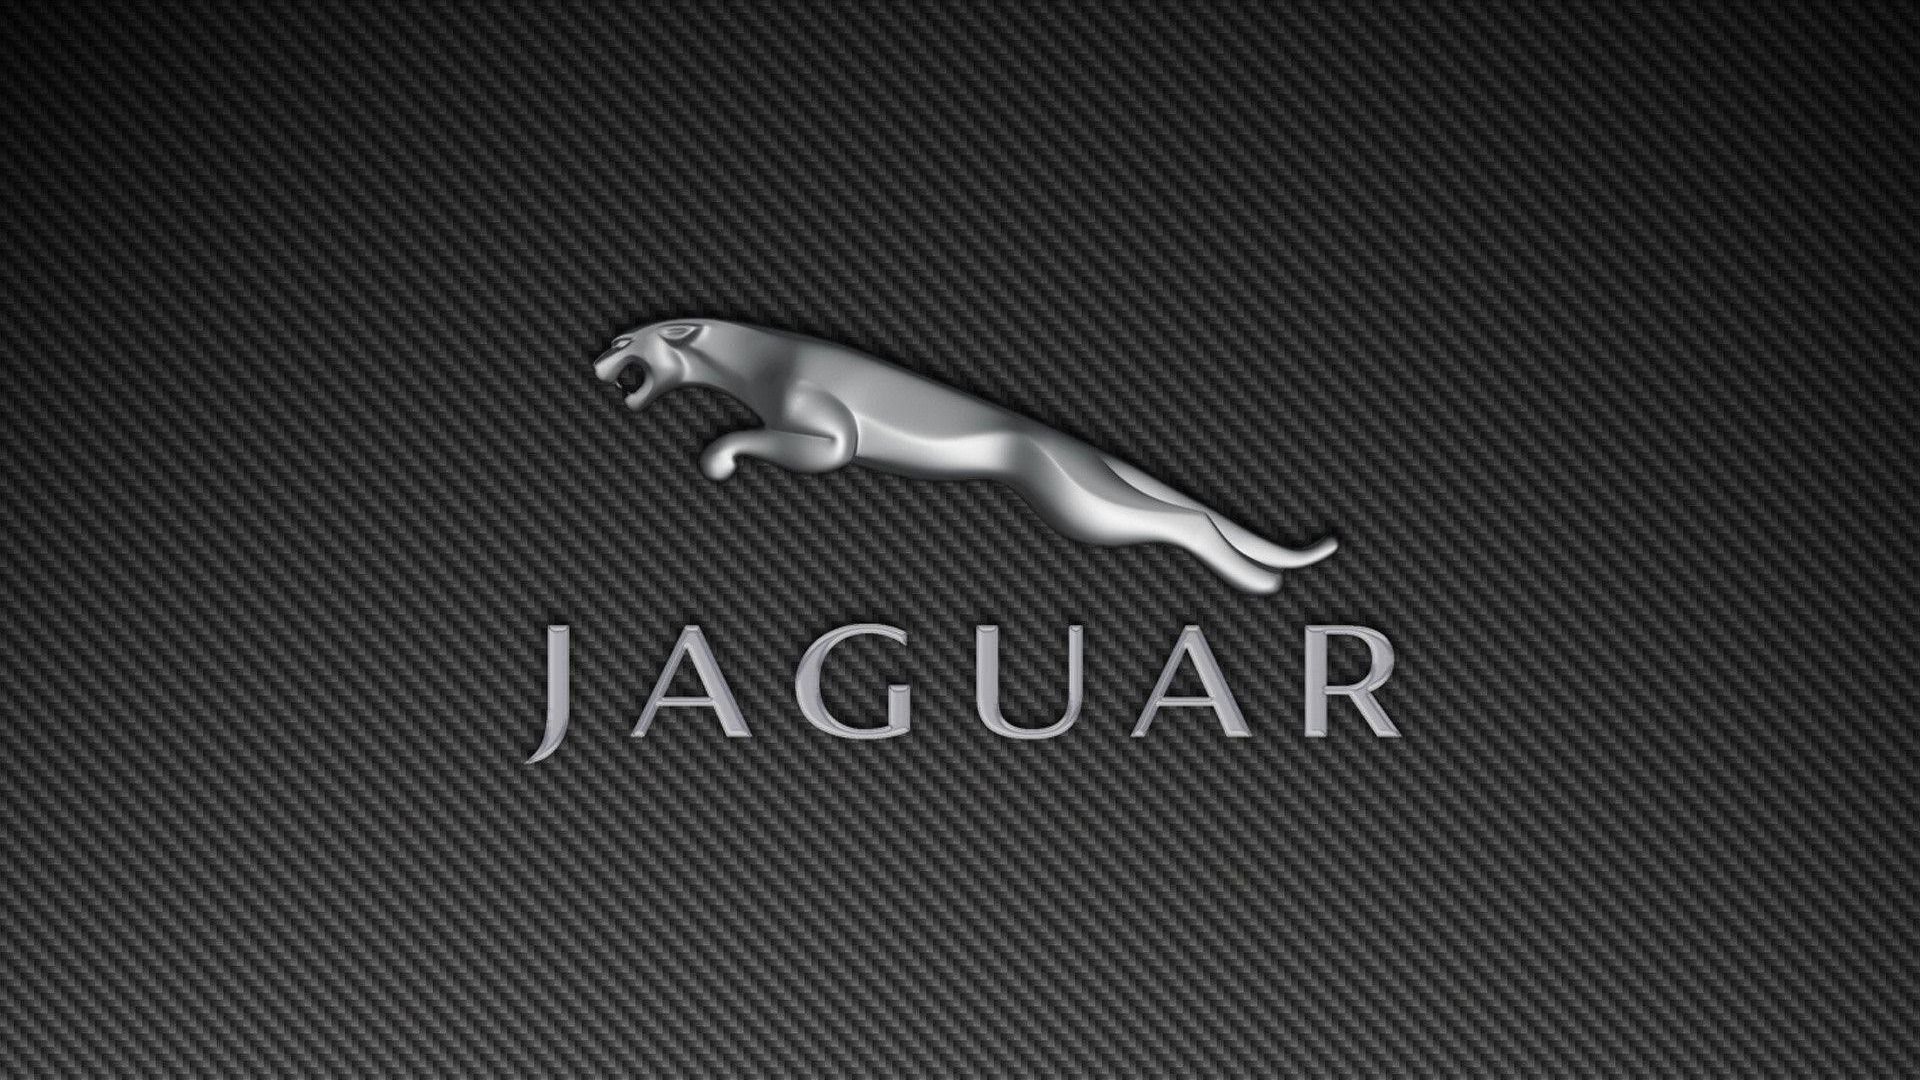 Jaguar Car Brand Logo with Pattern Background Wallpaper